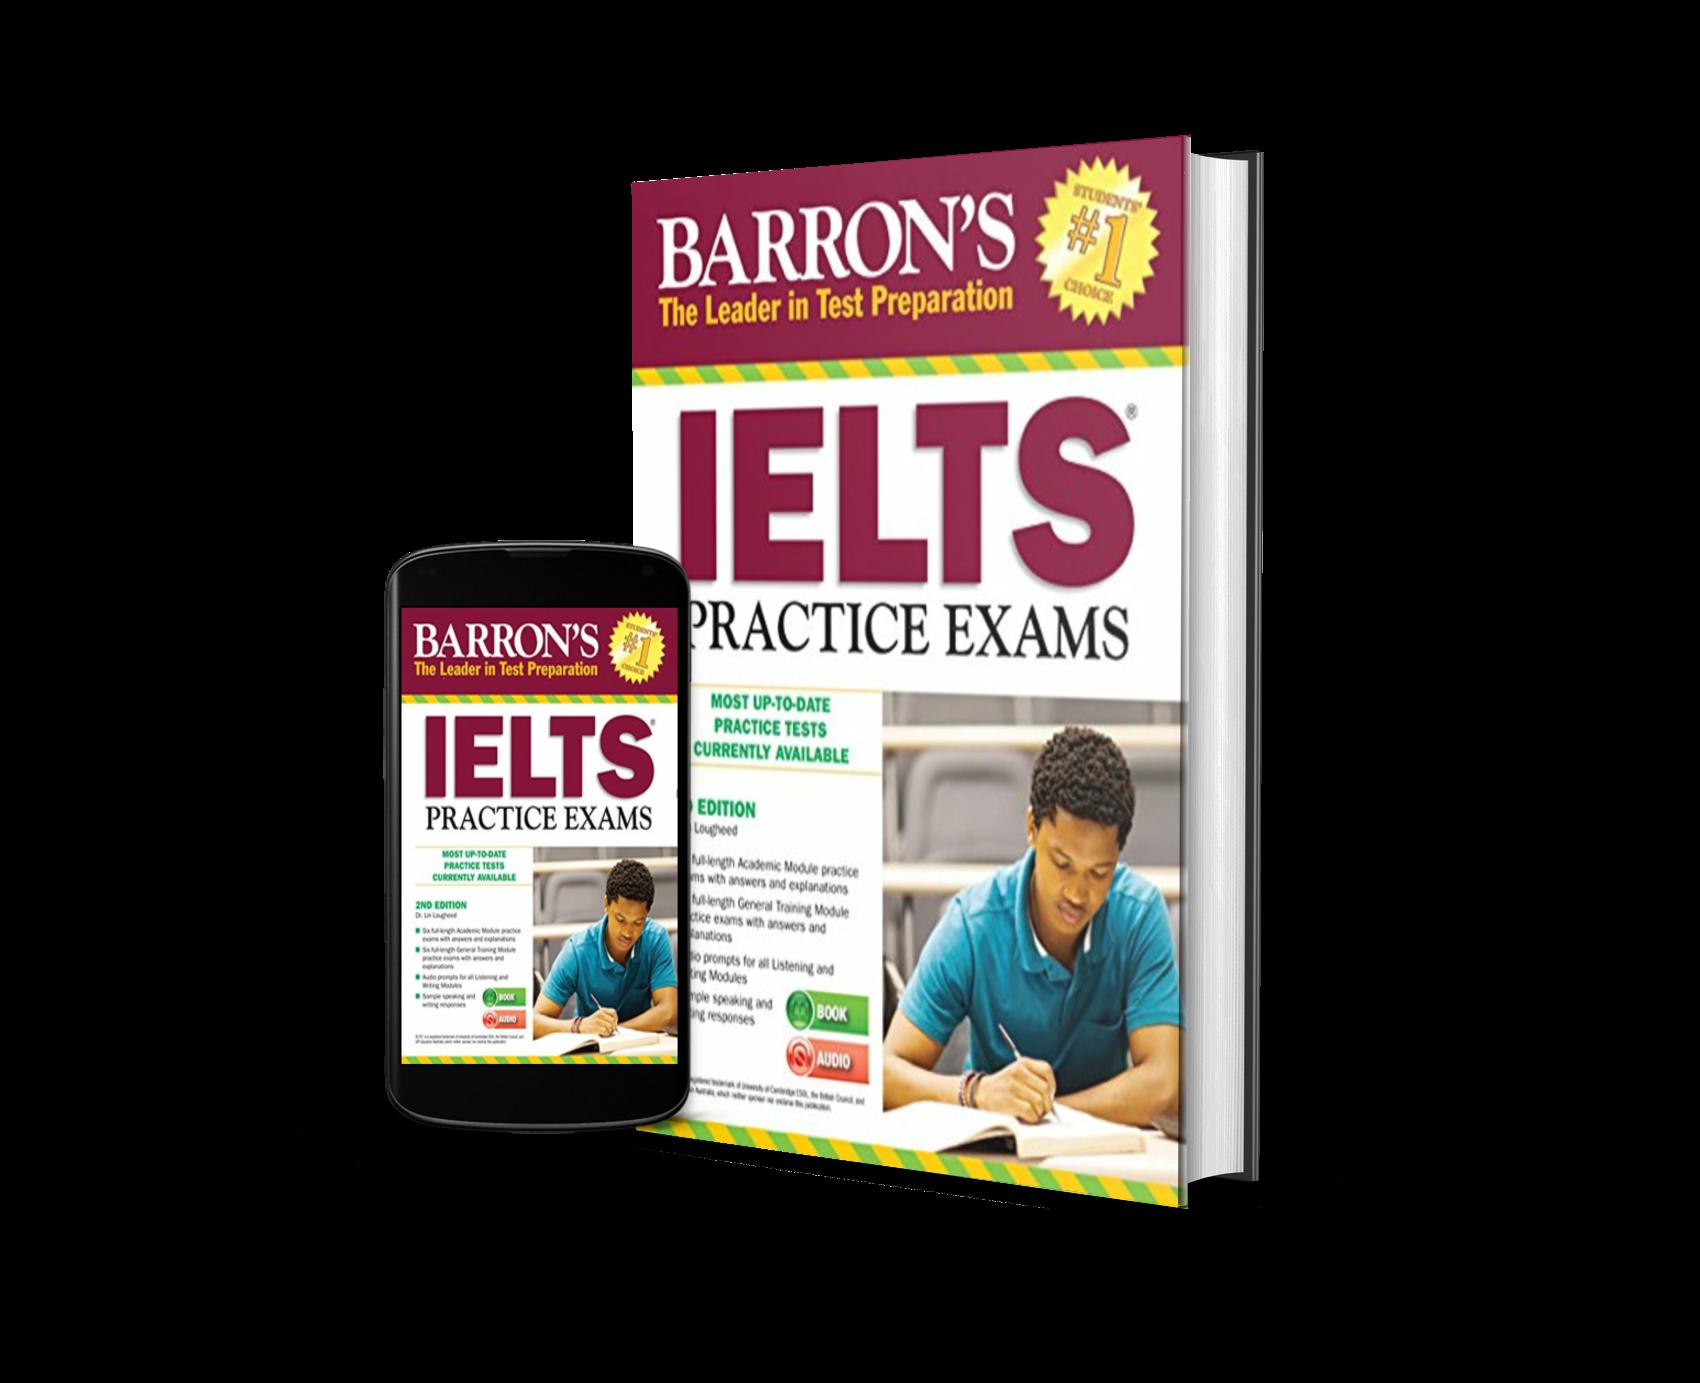 Barron's IELTS practice exams | Download pdf + audio